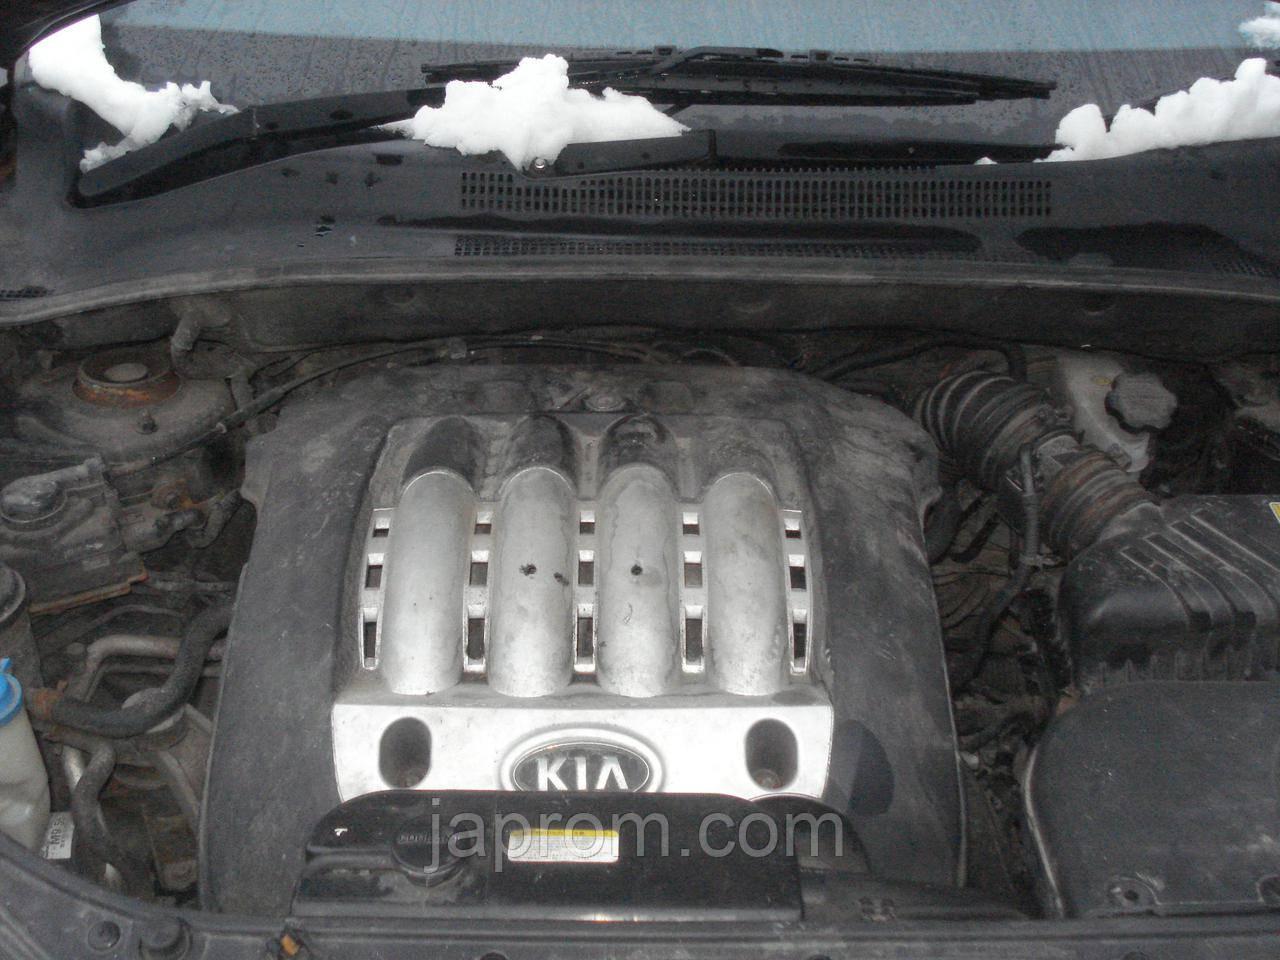 Мотор (Двигатель) Hyundai Tuscon, KIA Sportage 2.7 V6 G6BA 2004r